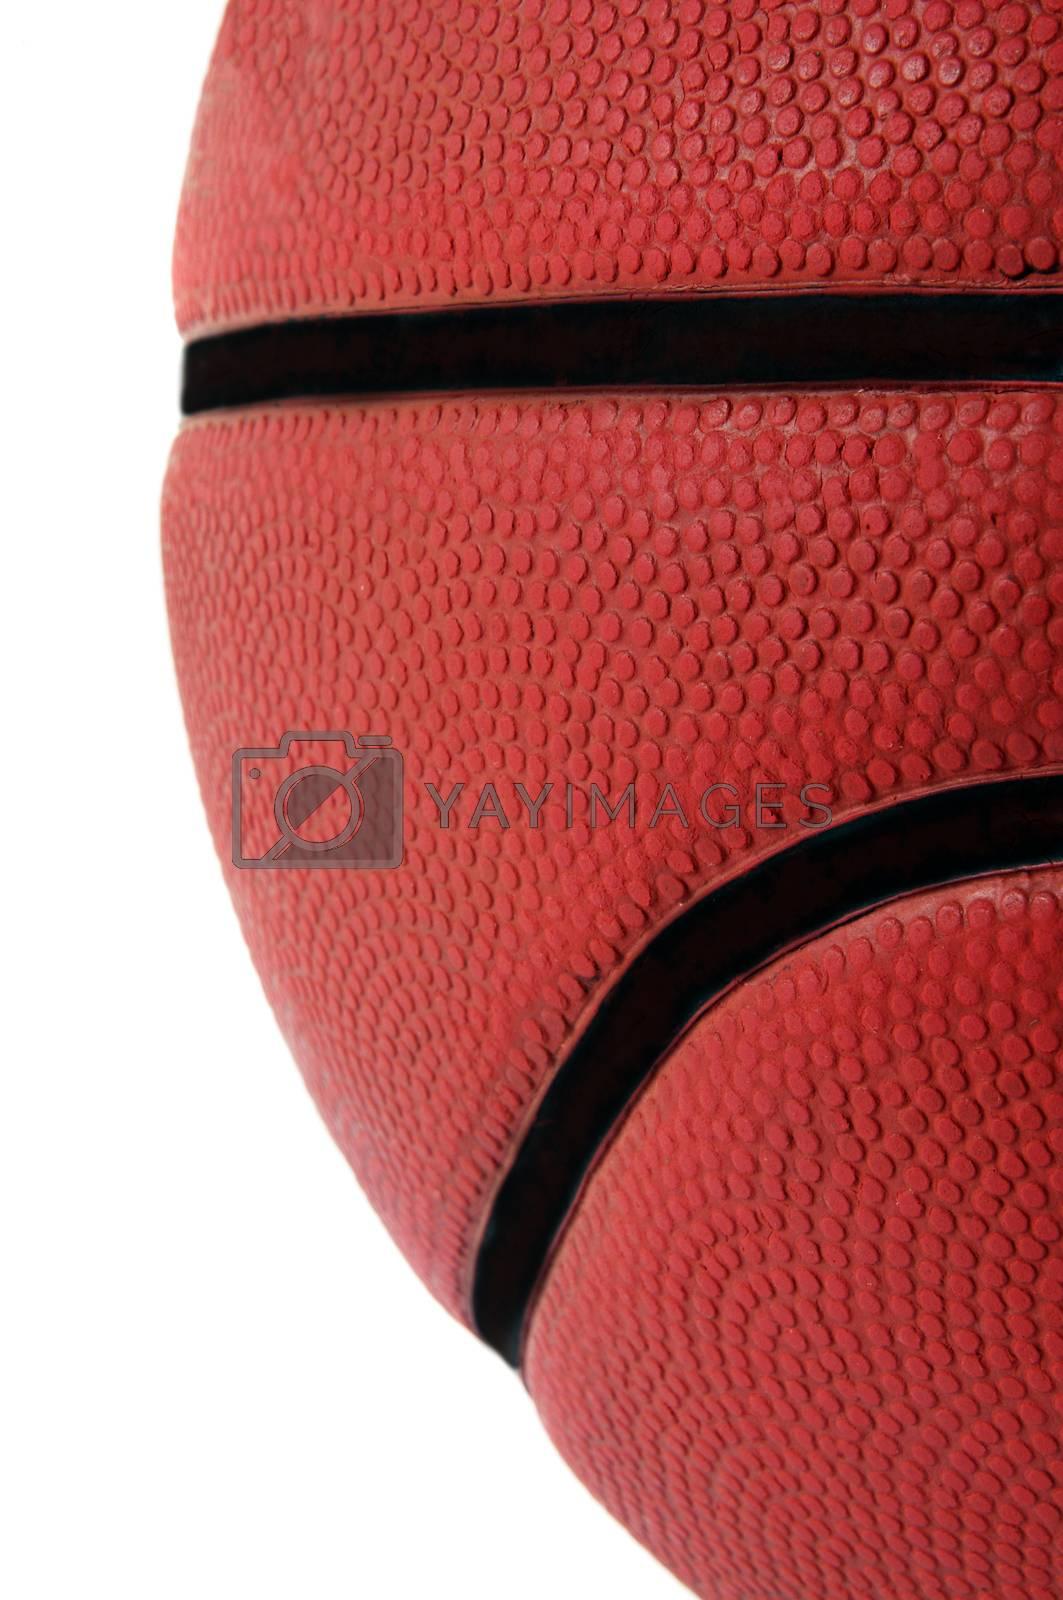 basketball  closeup texture.shallow DOF